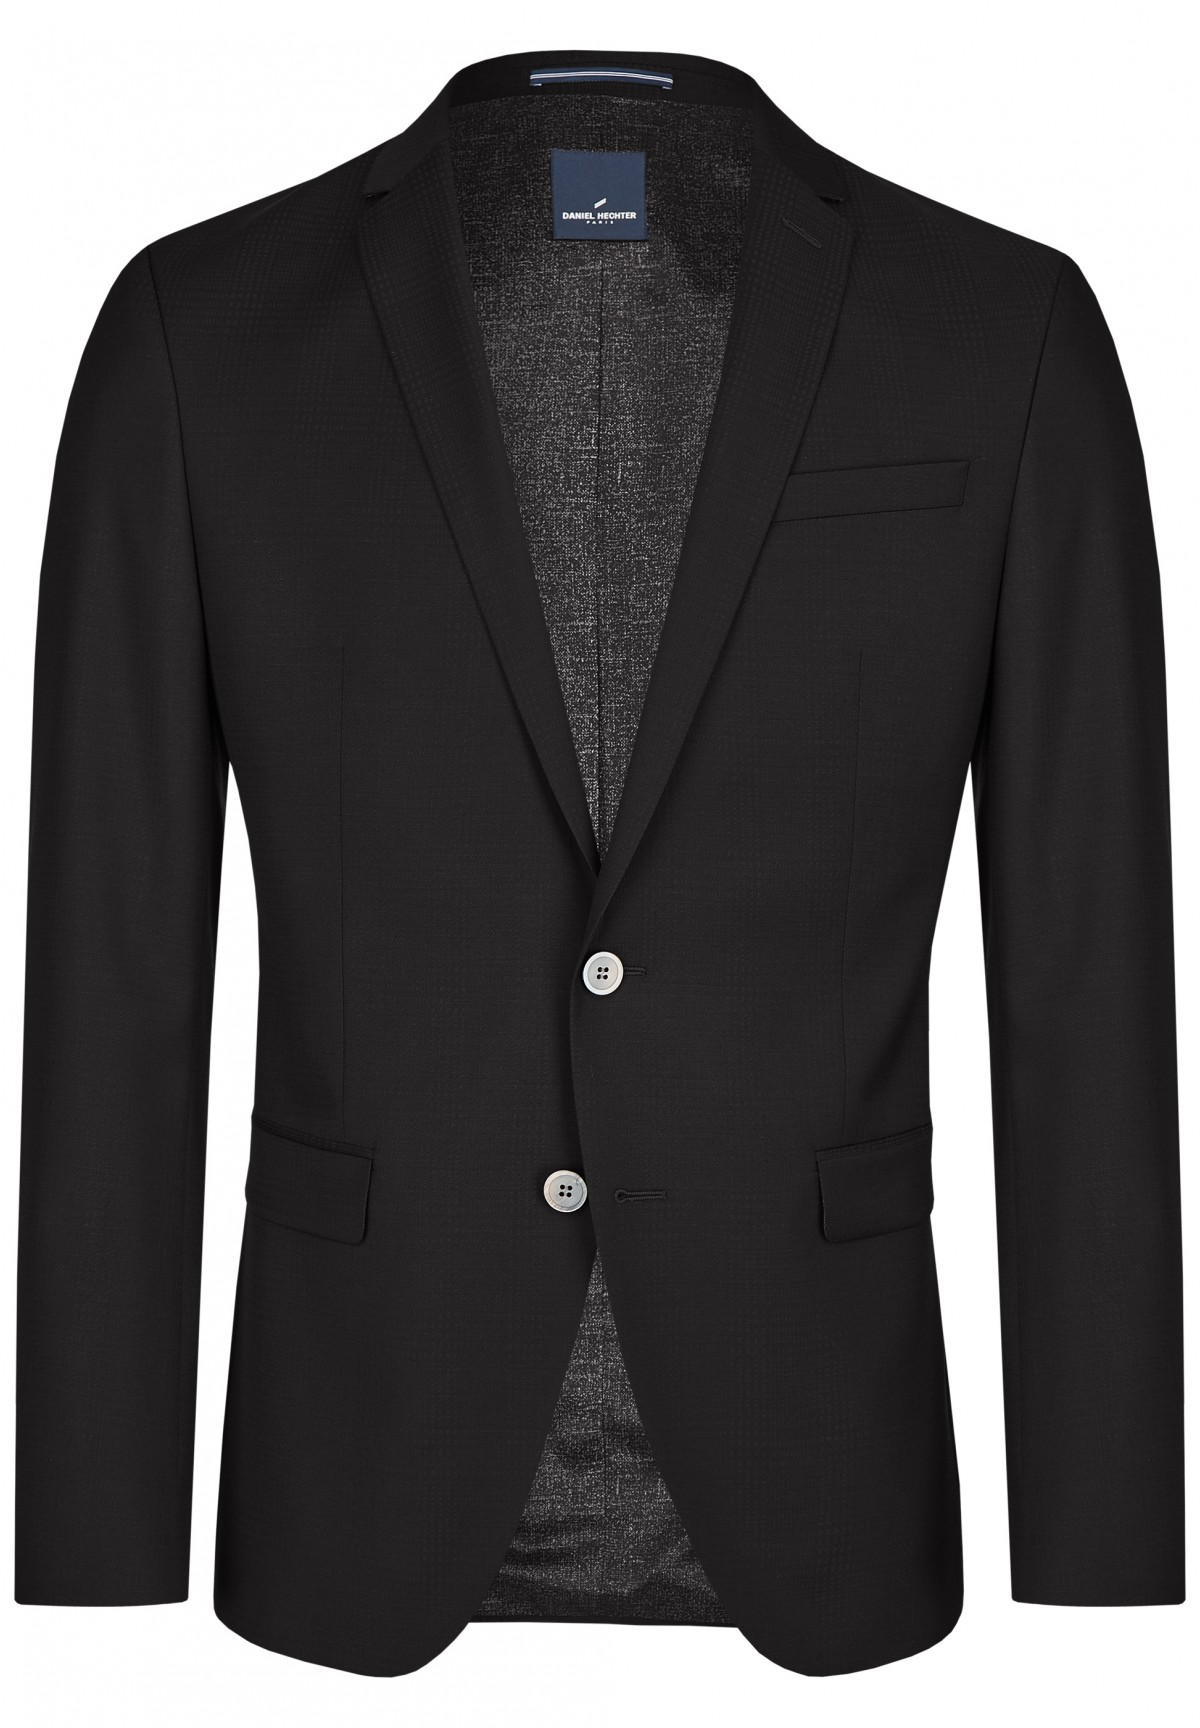 Costume cintré avec veste doublée /